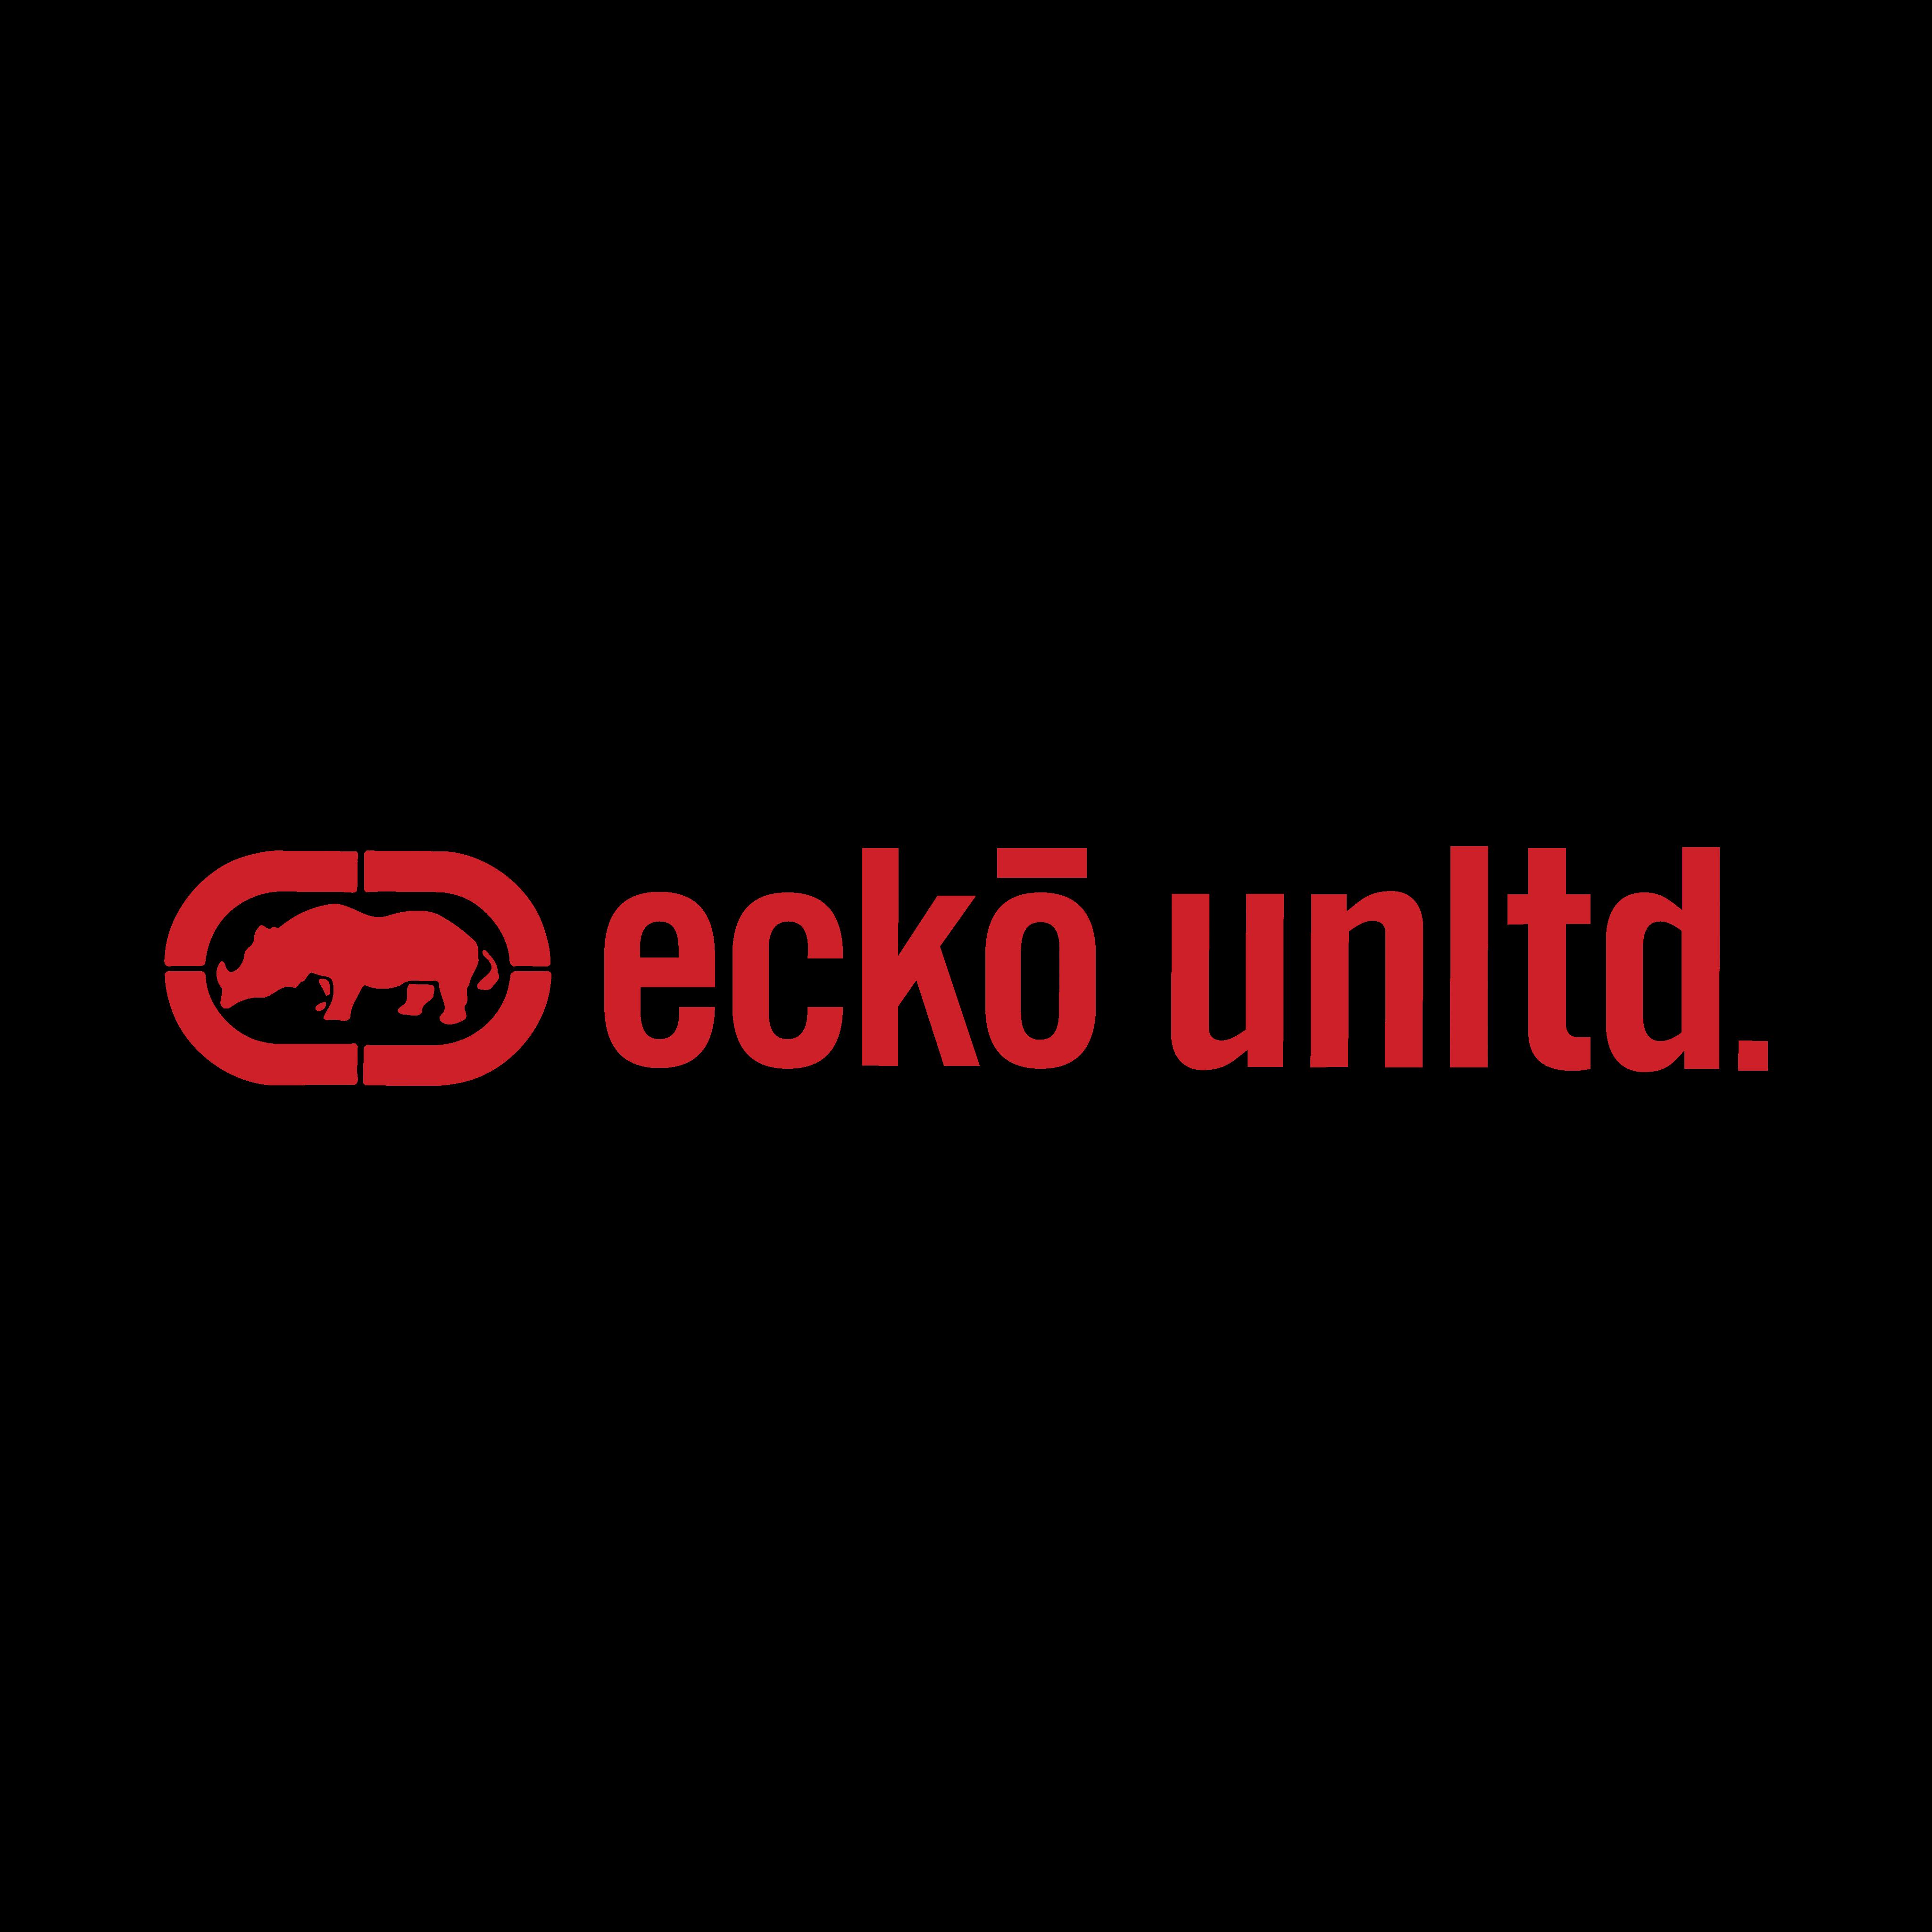 ecko unltd logo 0 - ecko Logo - ecko unltd Logo